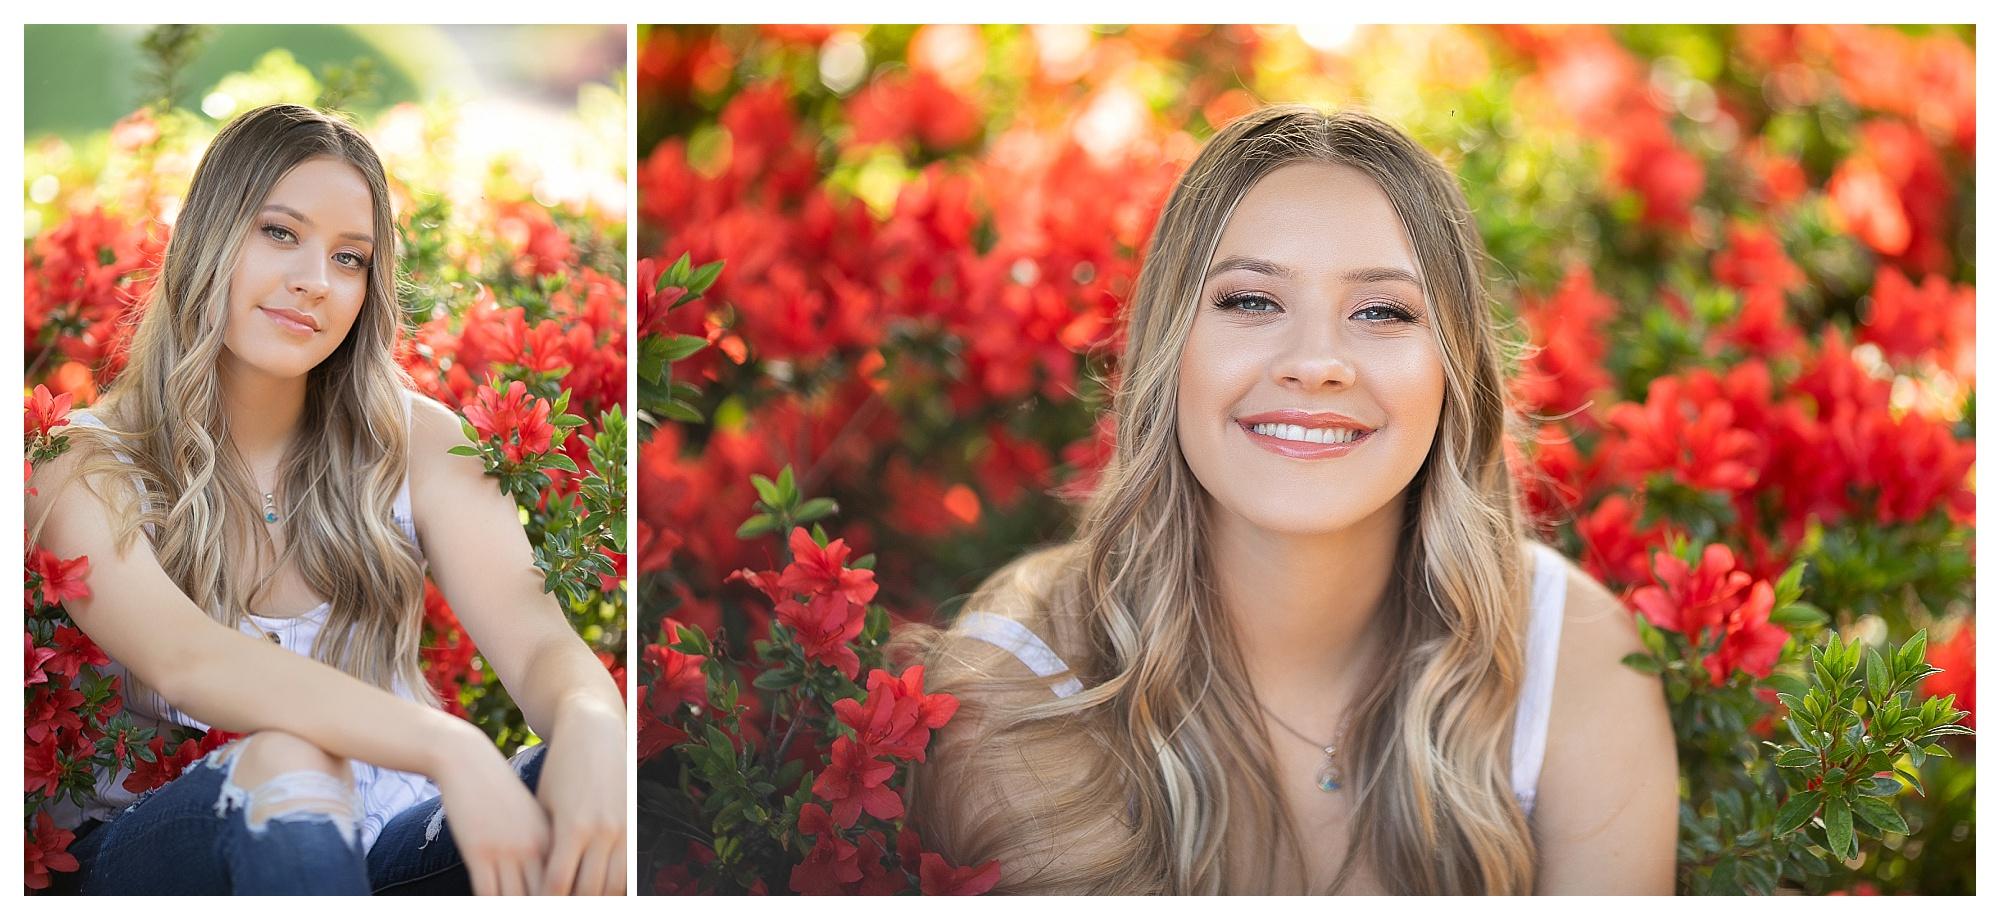 Senior high school girl spring portraits with flowers in Granite Bay California